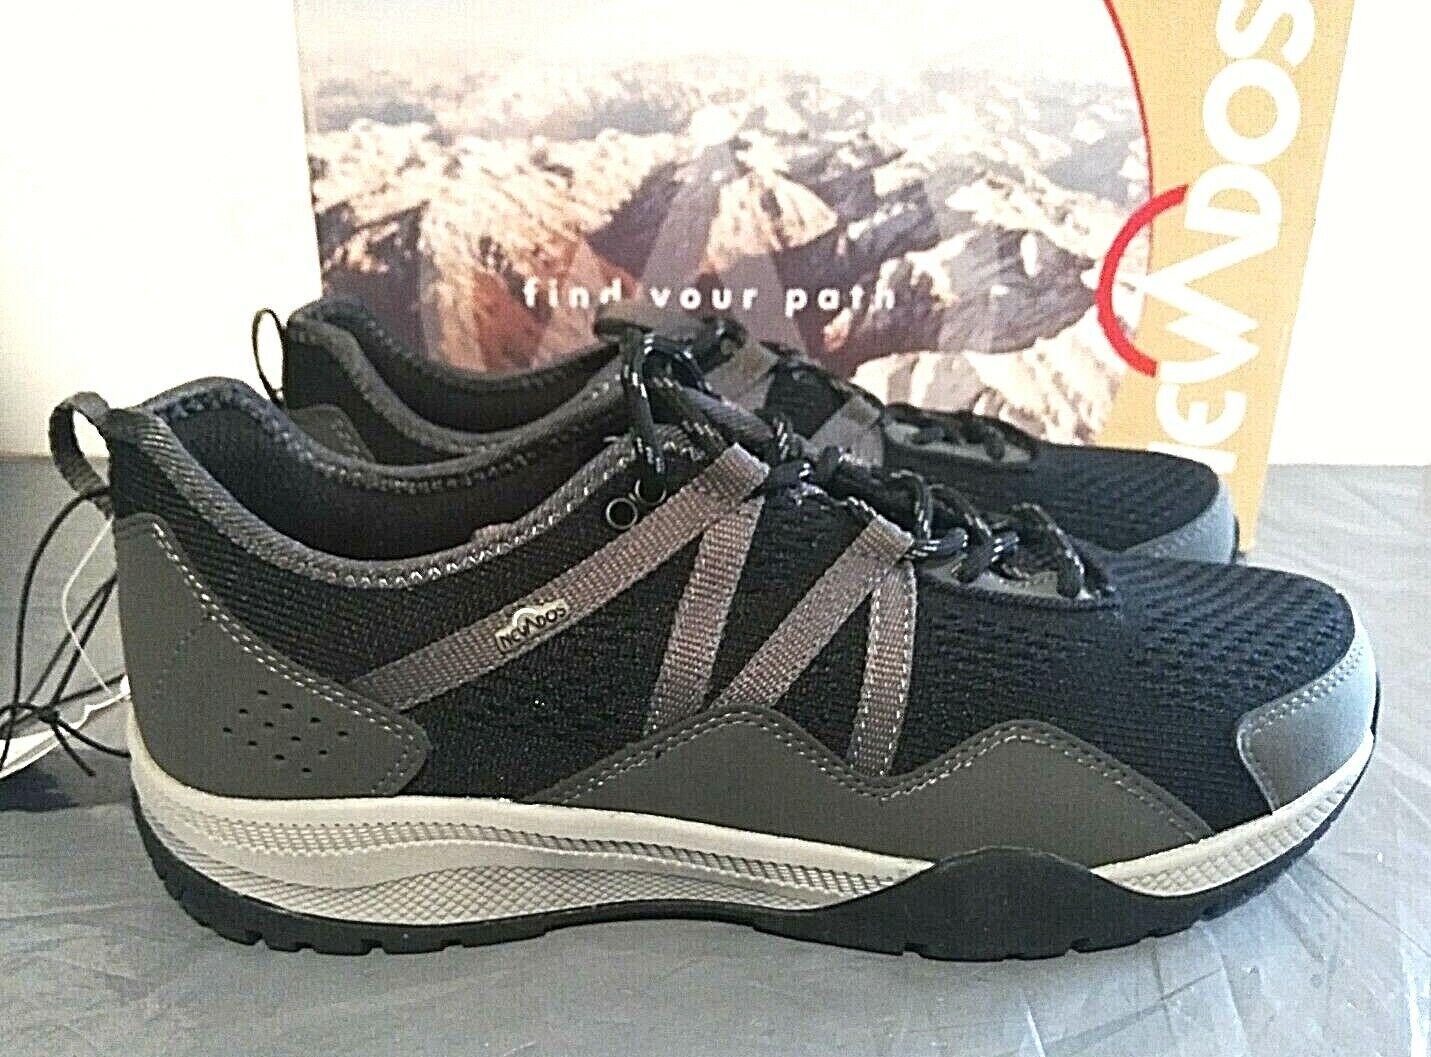 Nevados Men's Brandon Hiking Sneakers Shoes - PICK SIZE BLACK - 1G_09